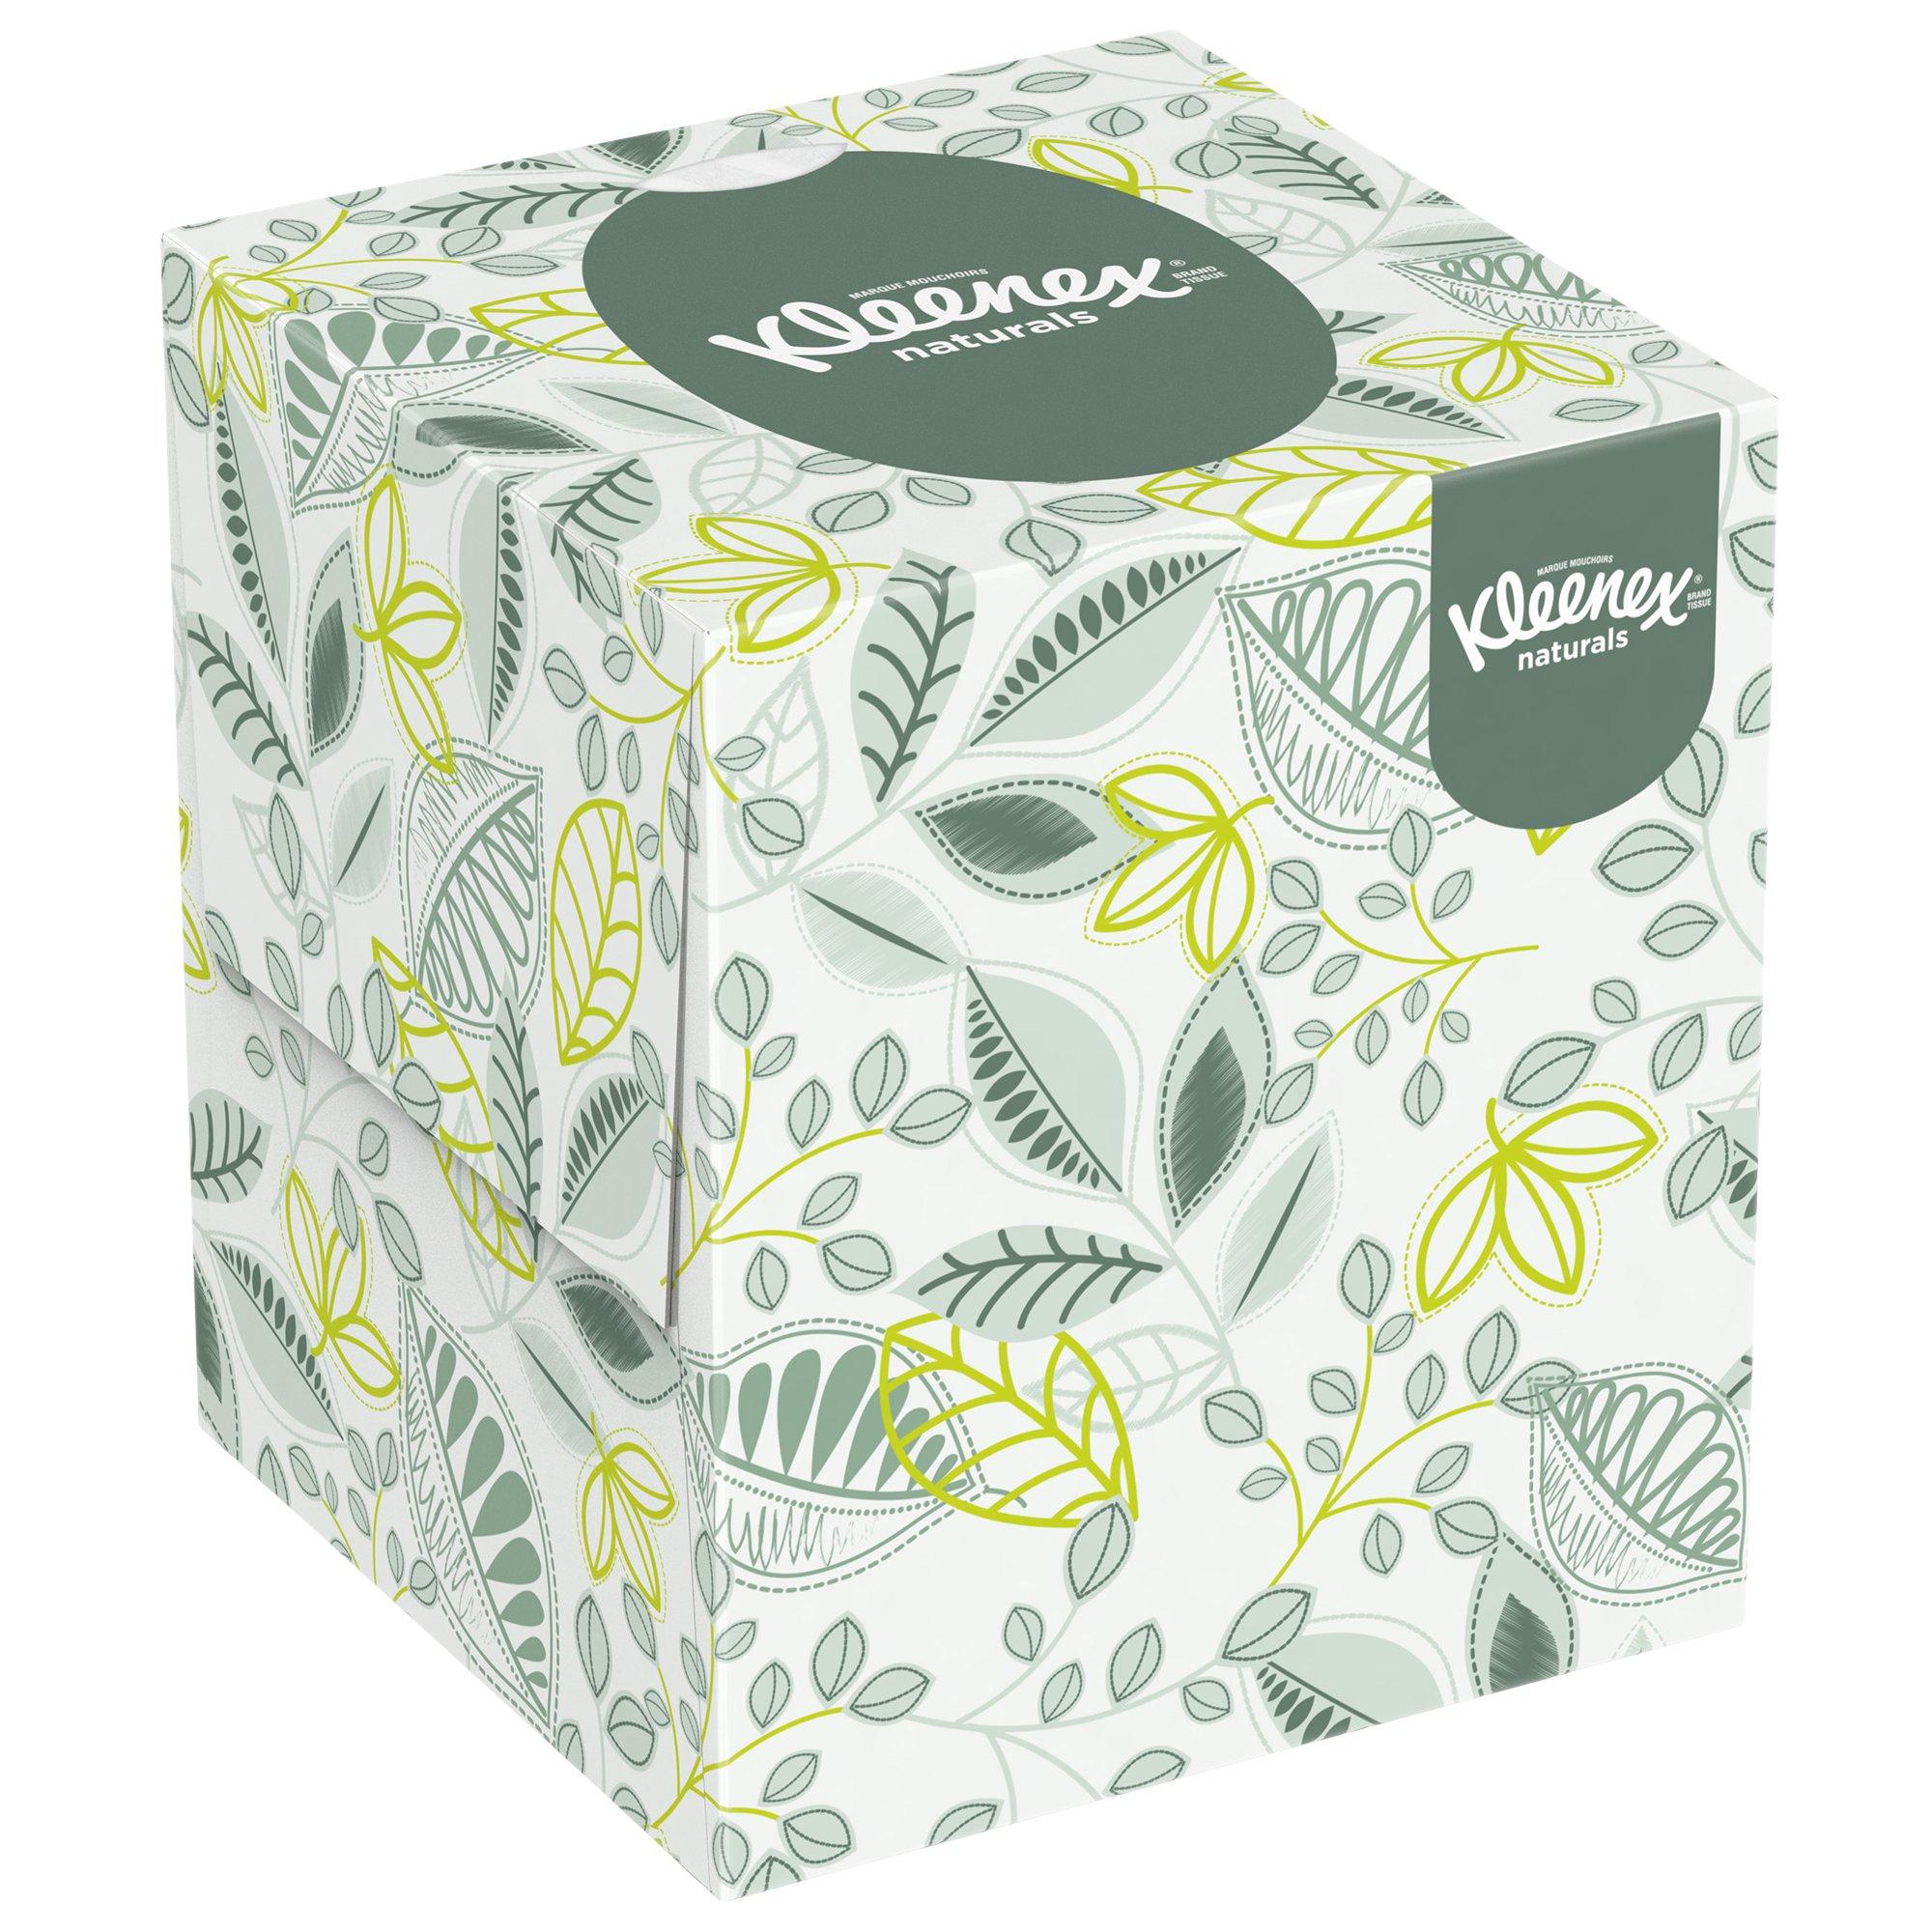 Kleenex Professional Naturals Boutique Facial Tissue Cube for Business (21272), Upright Face Tissue Box, 2-PLY, 6 Bundles/Case, 6 Boxes/Bundle, 36 Boxes/Case